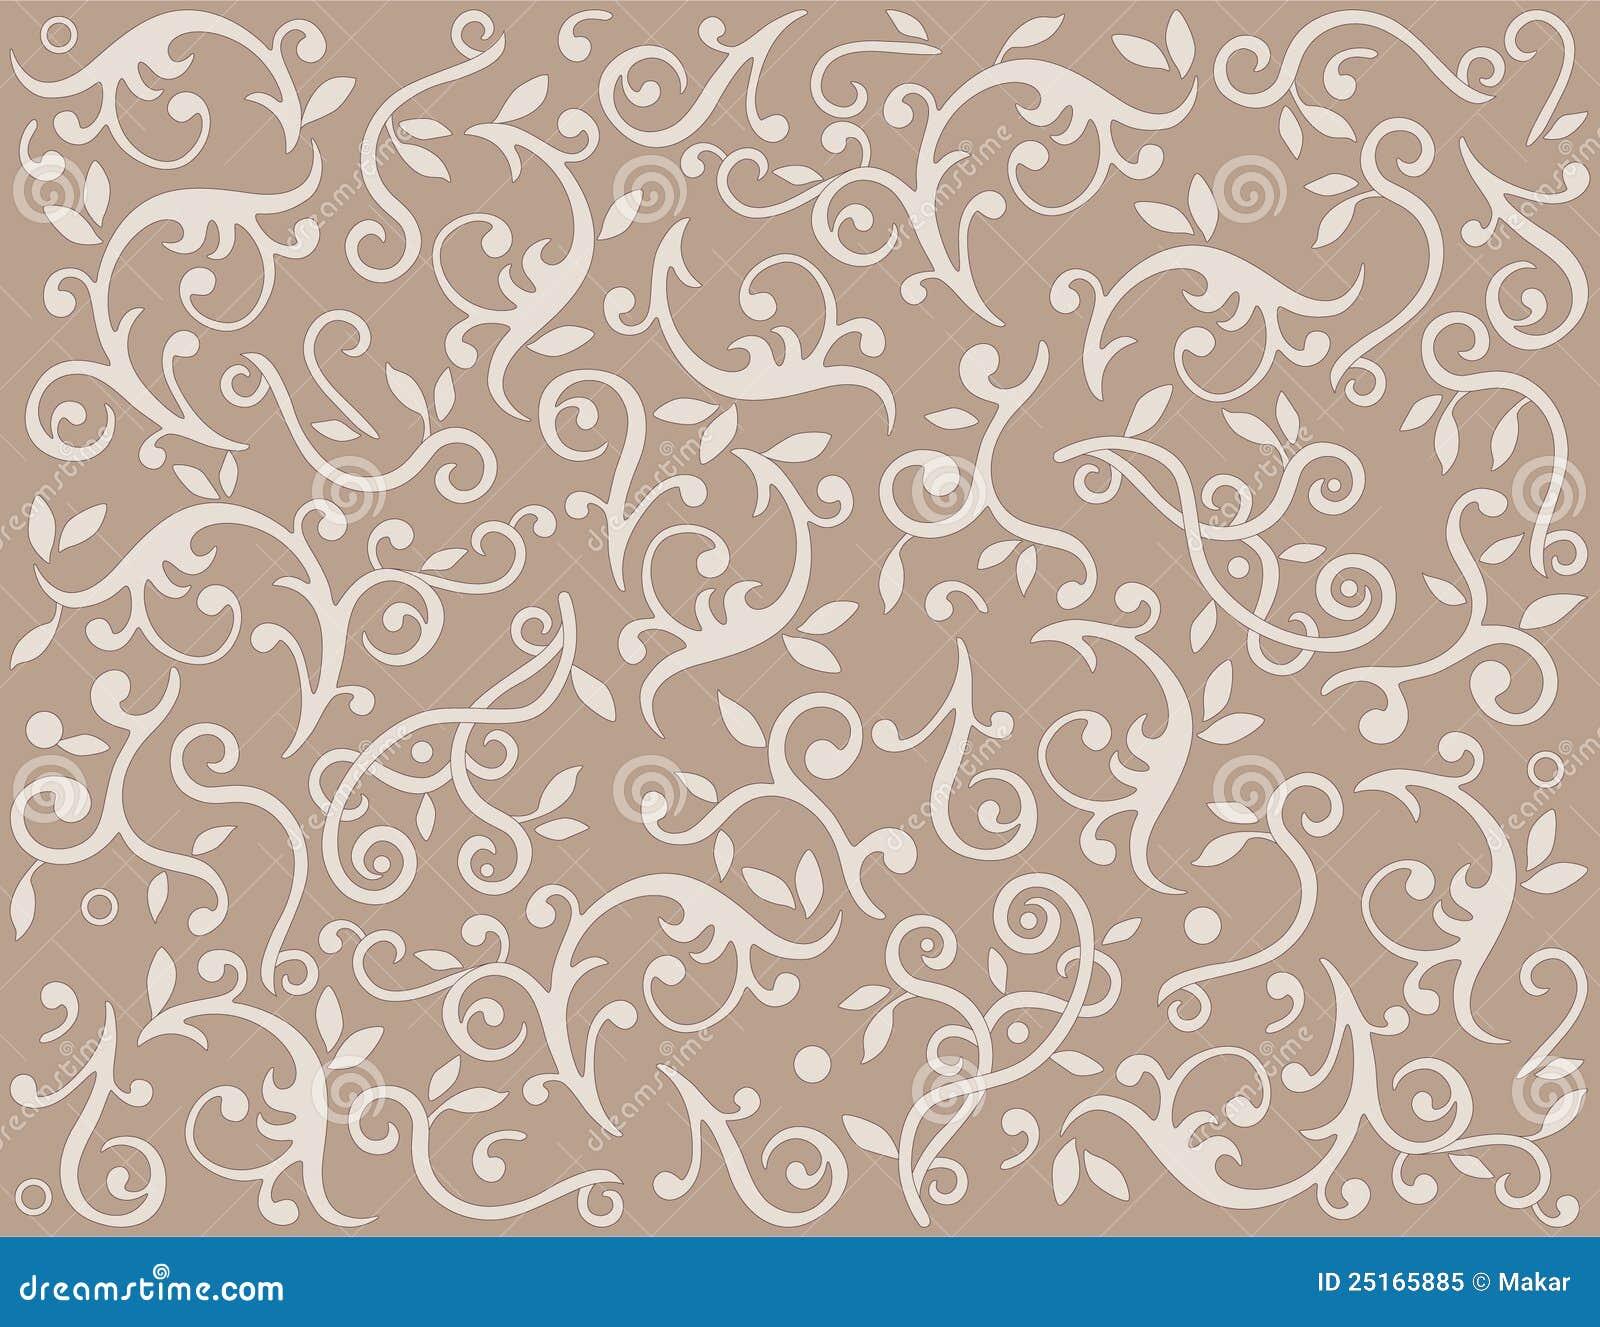 Patterned Background Royalty Free Stock Photo Image